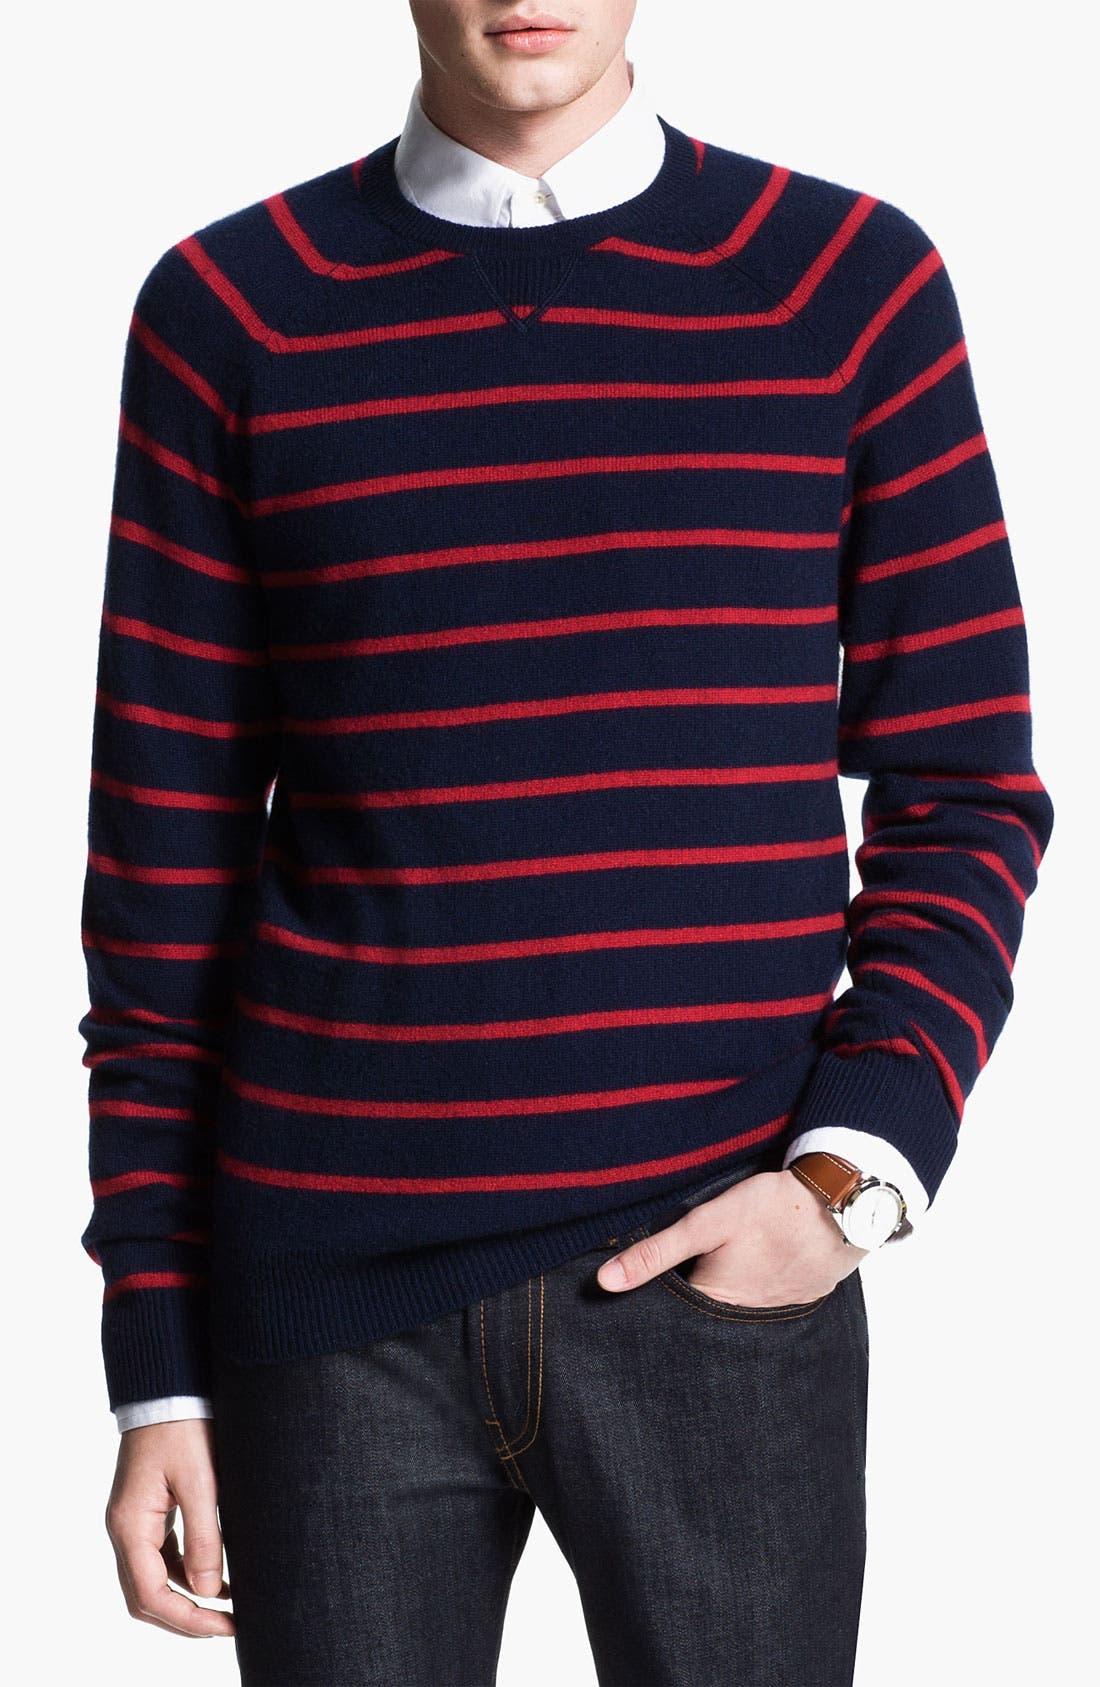 Alternate Image 1 Selected - 1901 Stripe Cashmere Sweater